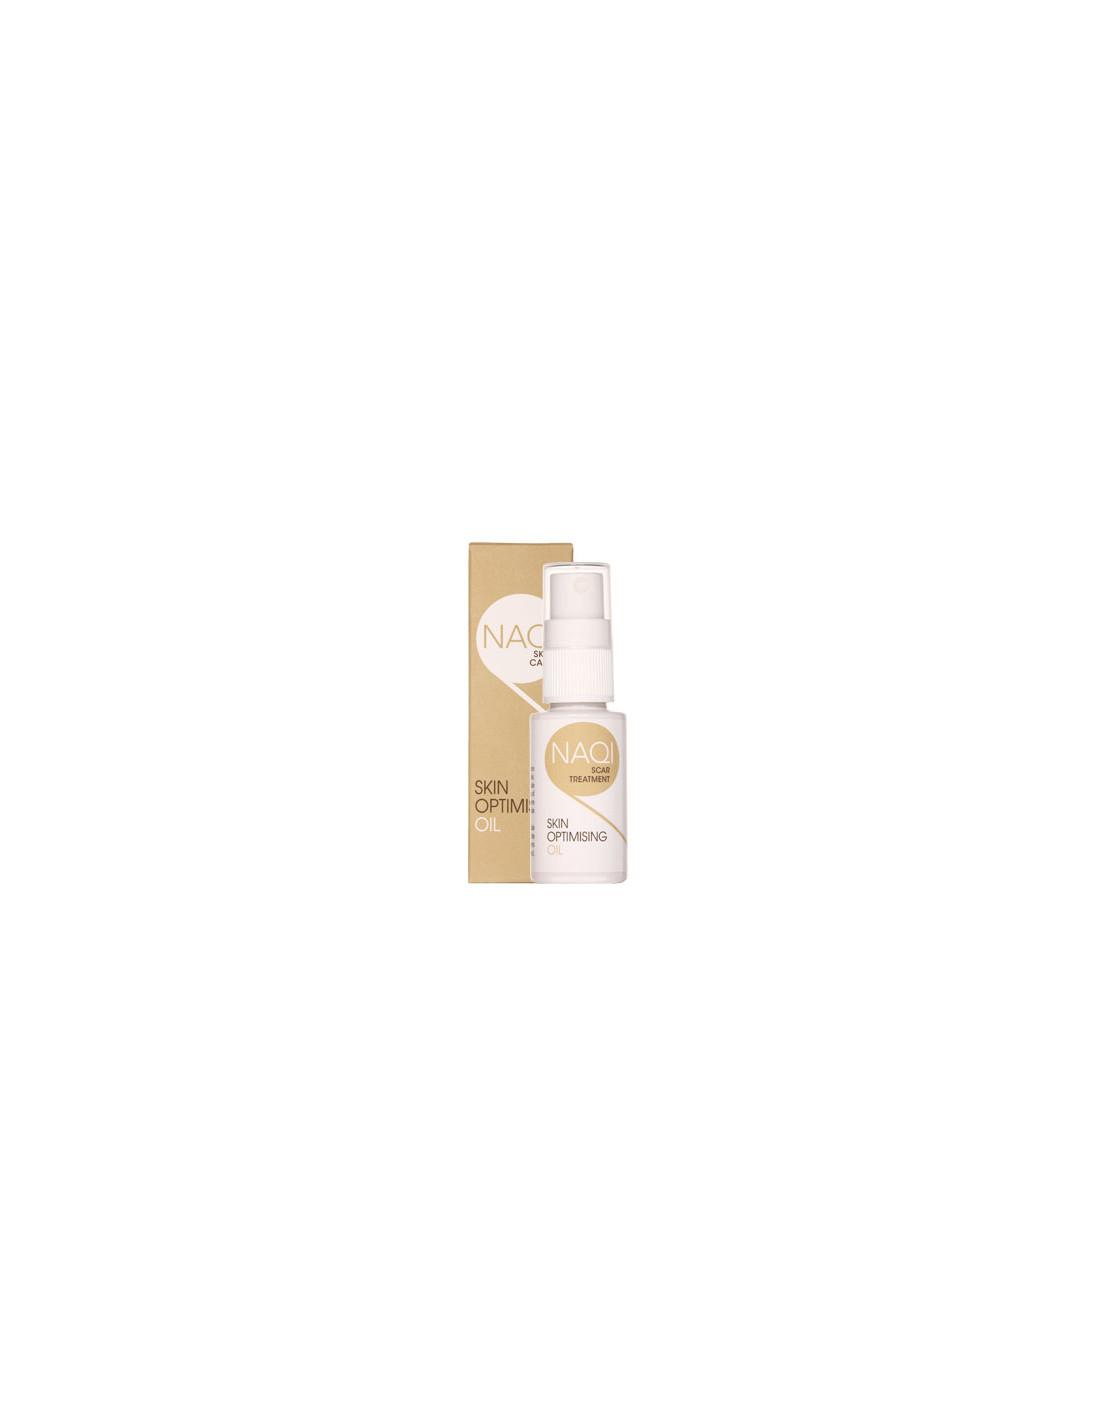 NAQI® Skin Optimising Oil